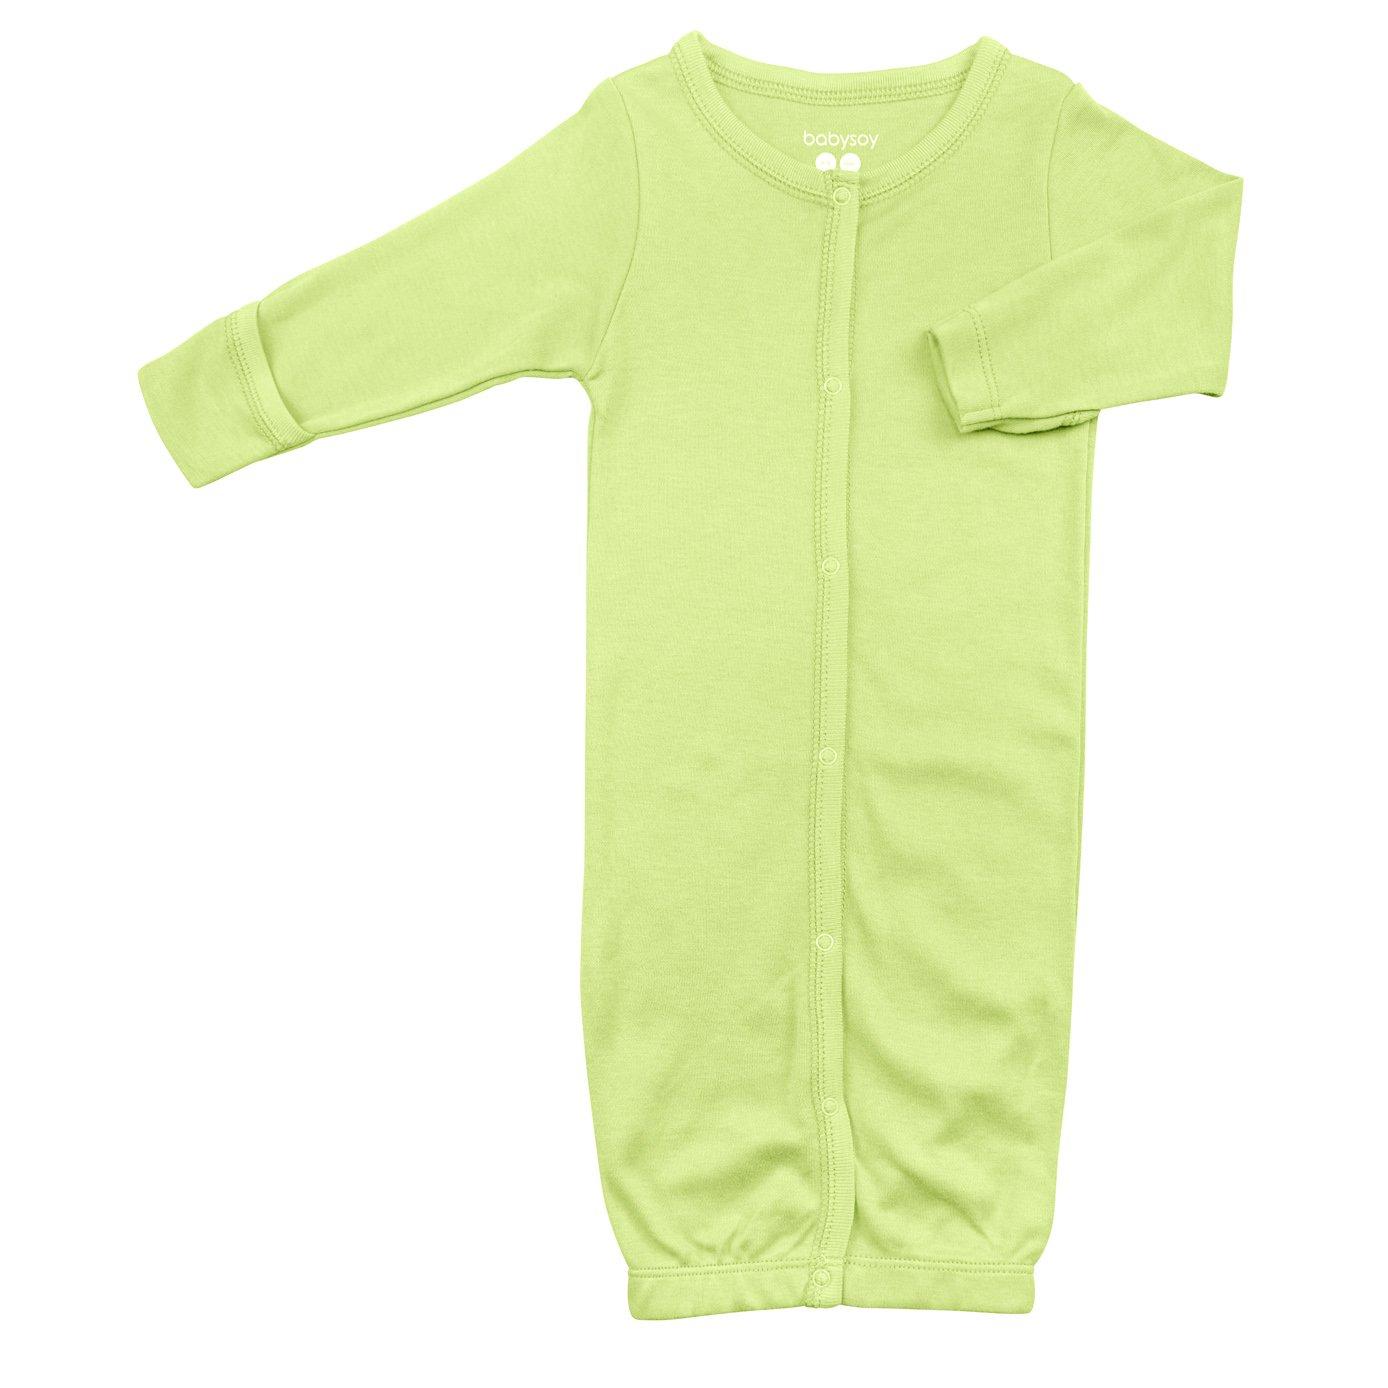 Babysoy Modern Solid Bundler/Gown